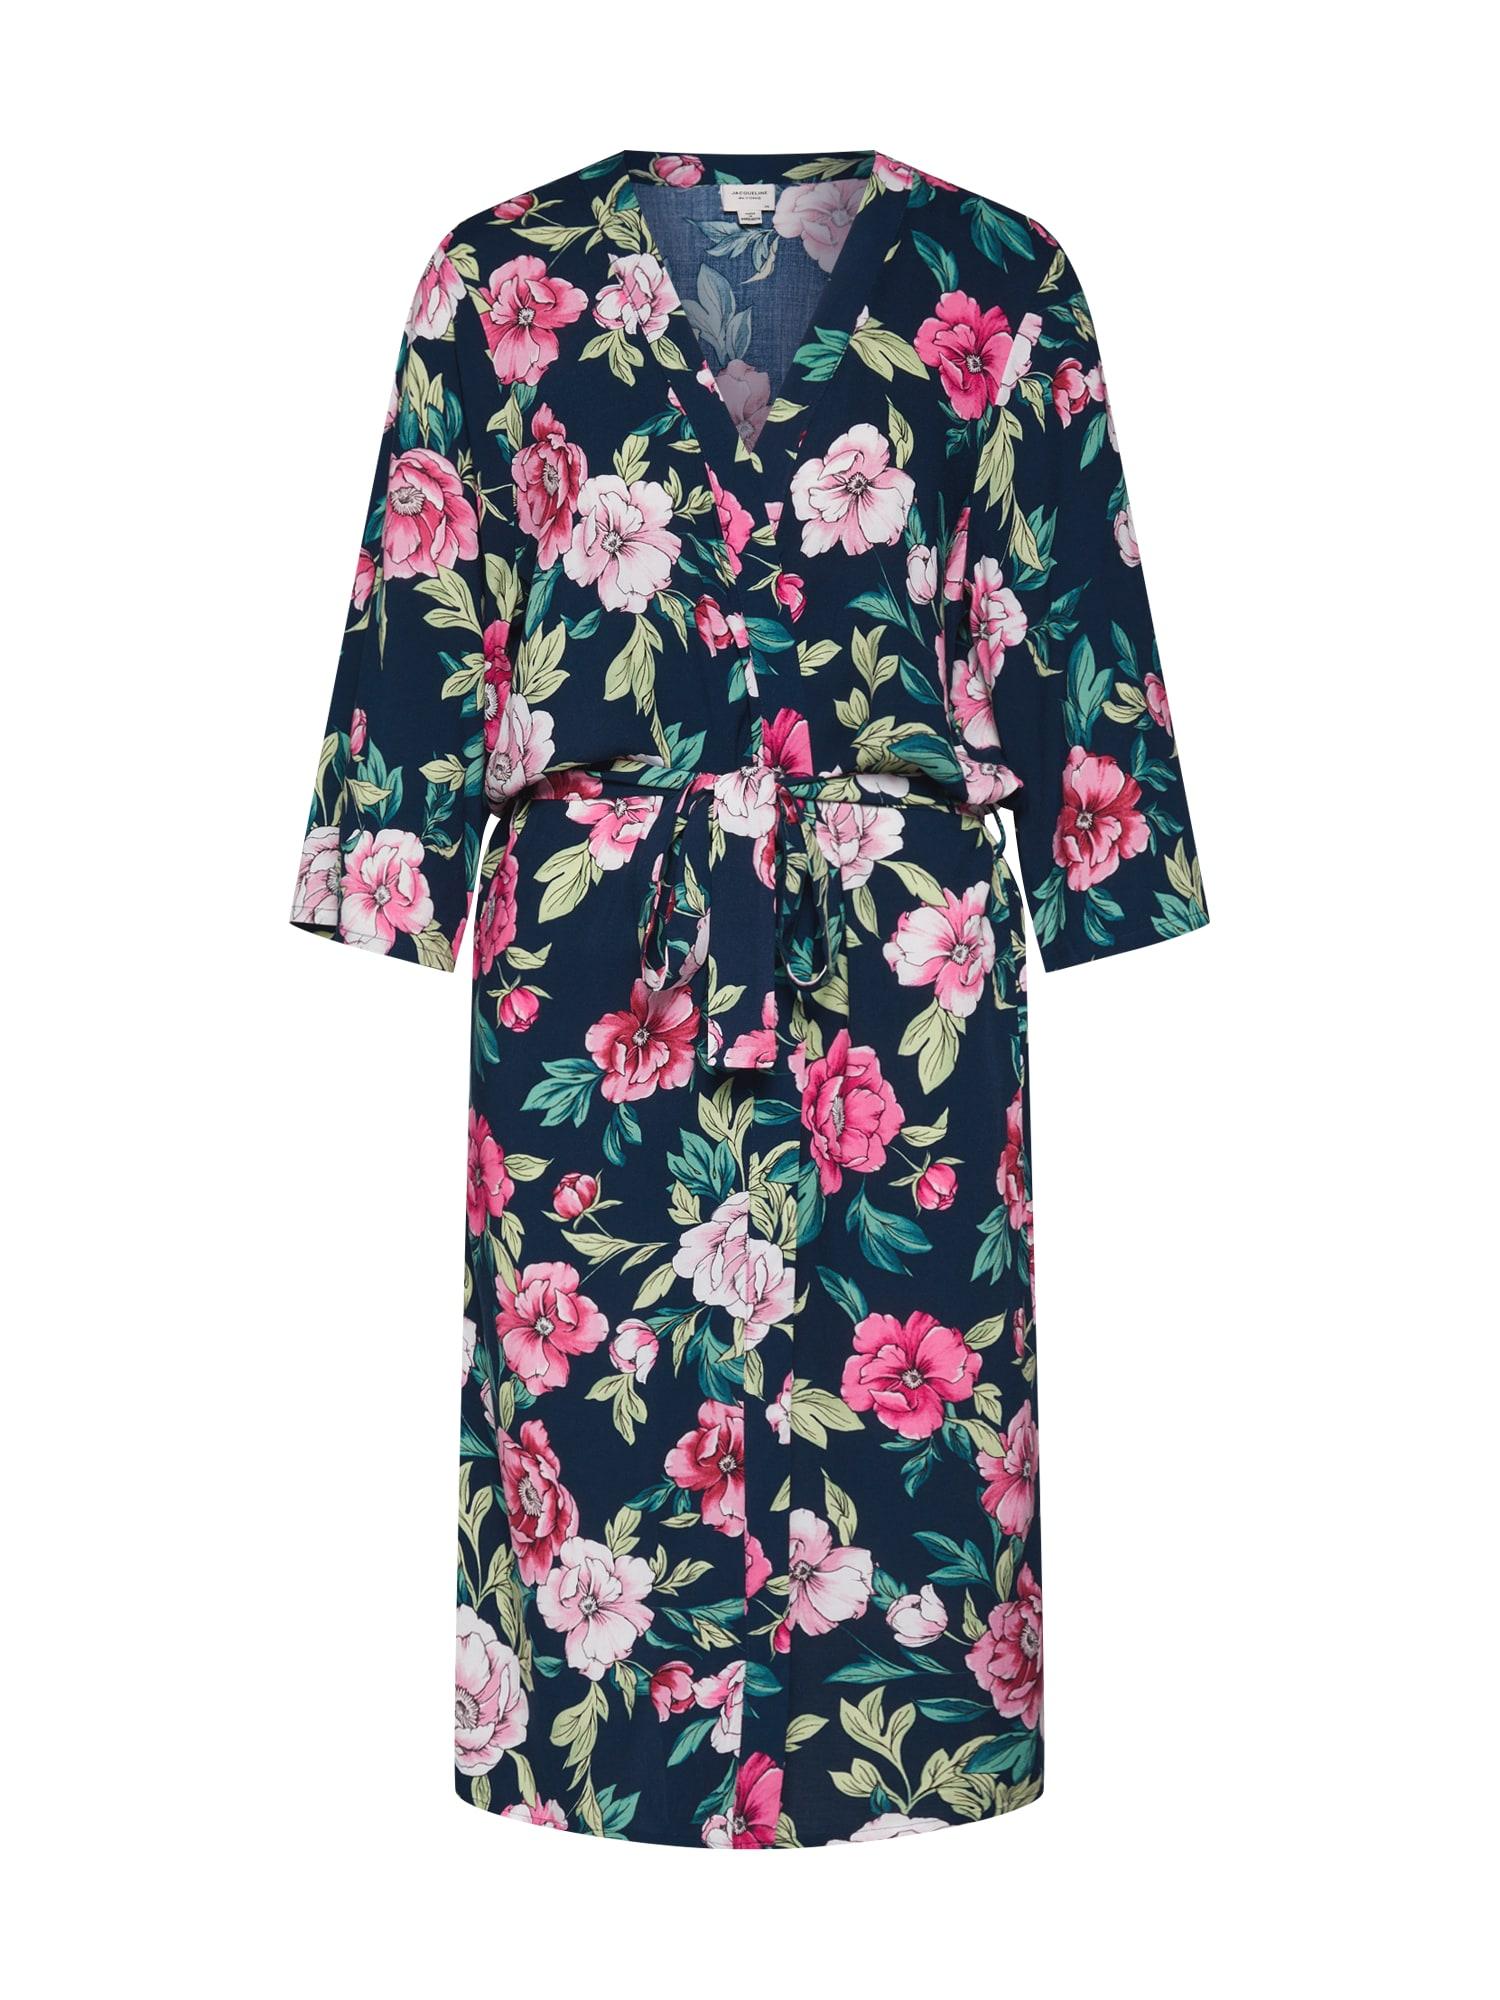 Kimono JDYSTAR 34 KIMONO WVN FS námořnická modř pink JACQUELINE De YONG